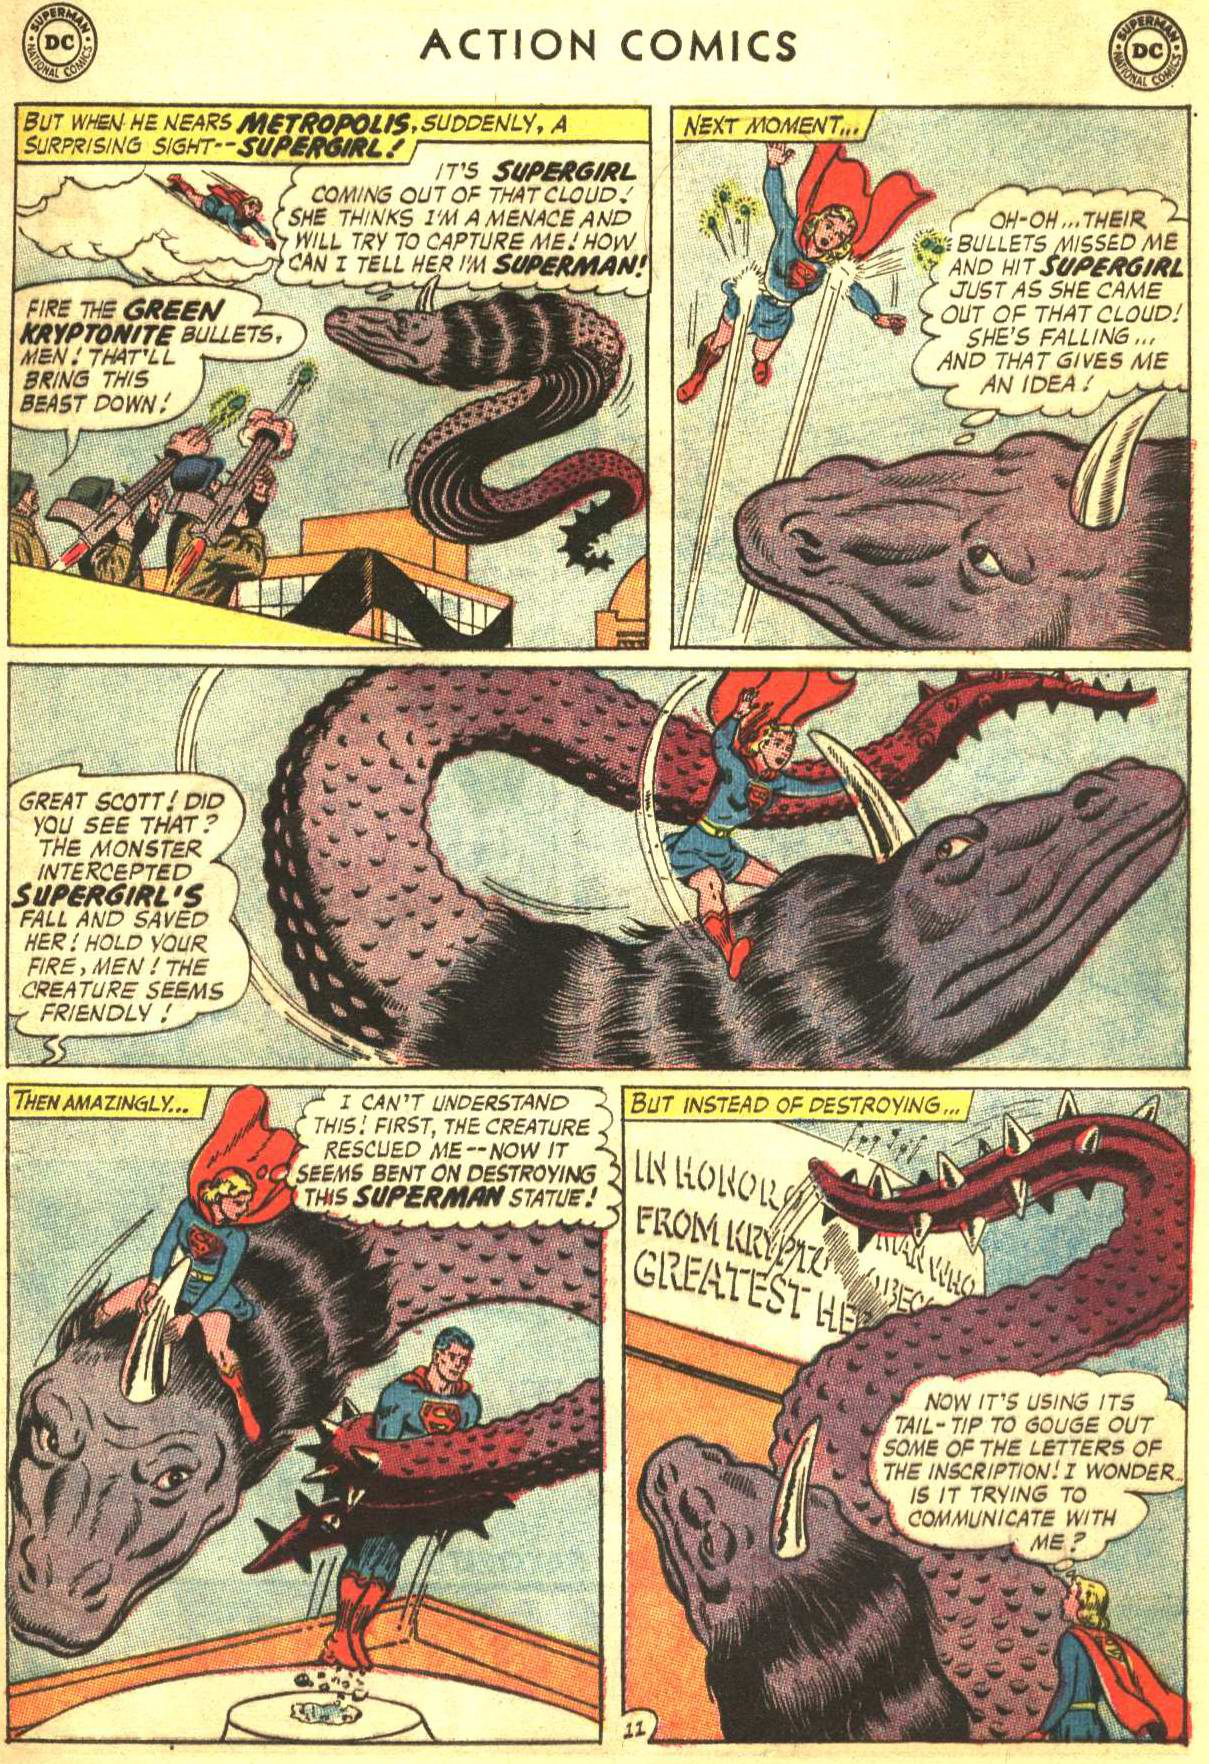 Action Comics (1938) 303 Page 11